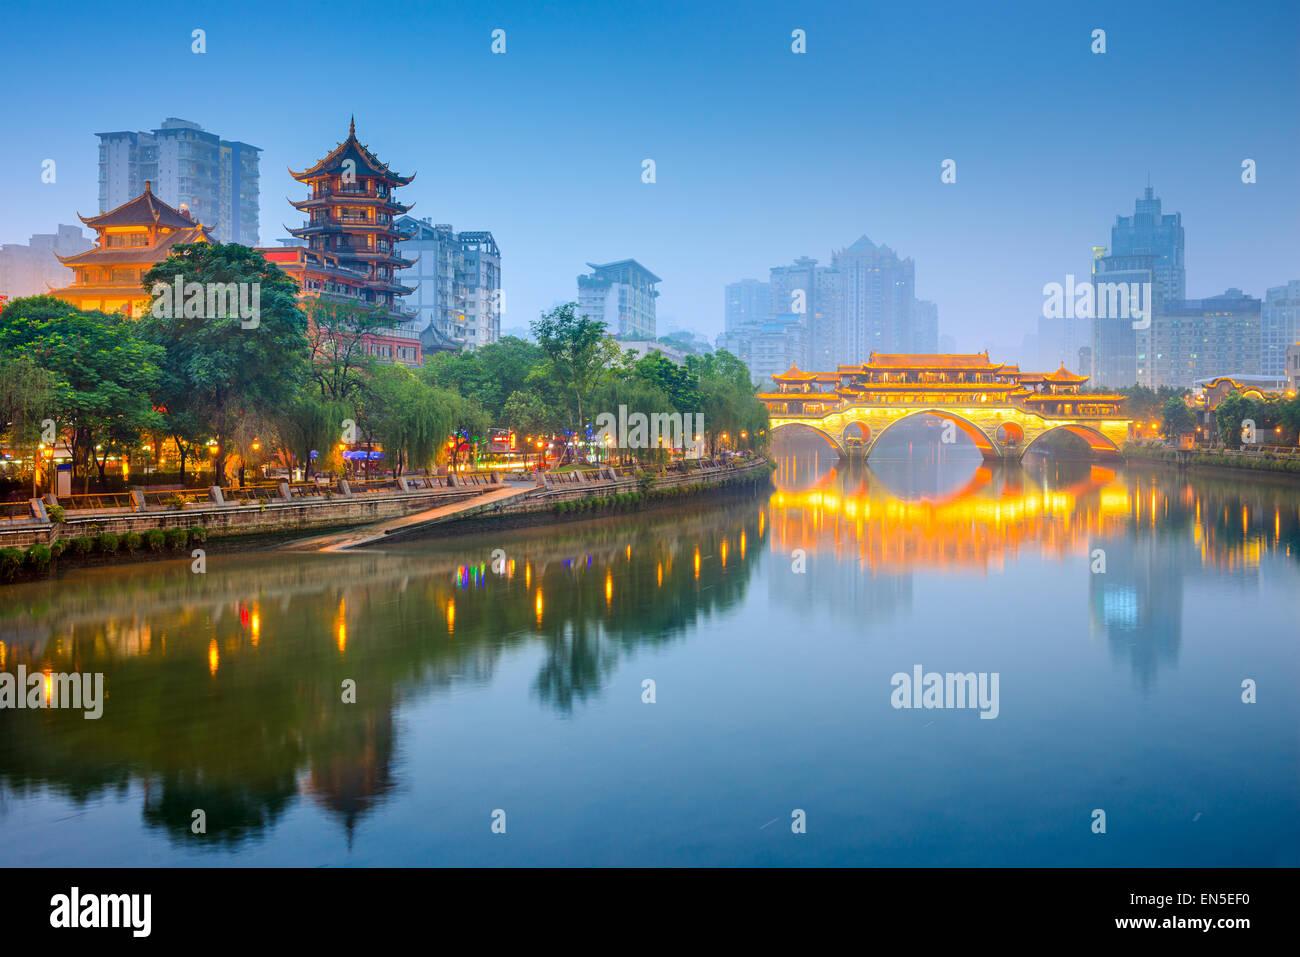 Chengdu, China Skyline der Stadt am Fluss Jin mit Anshun Bridge. Stockbild